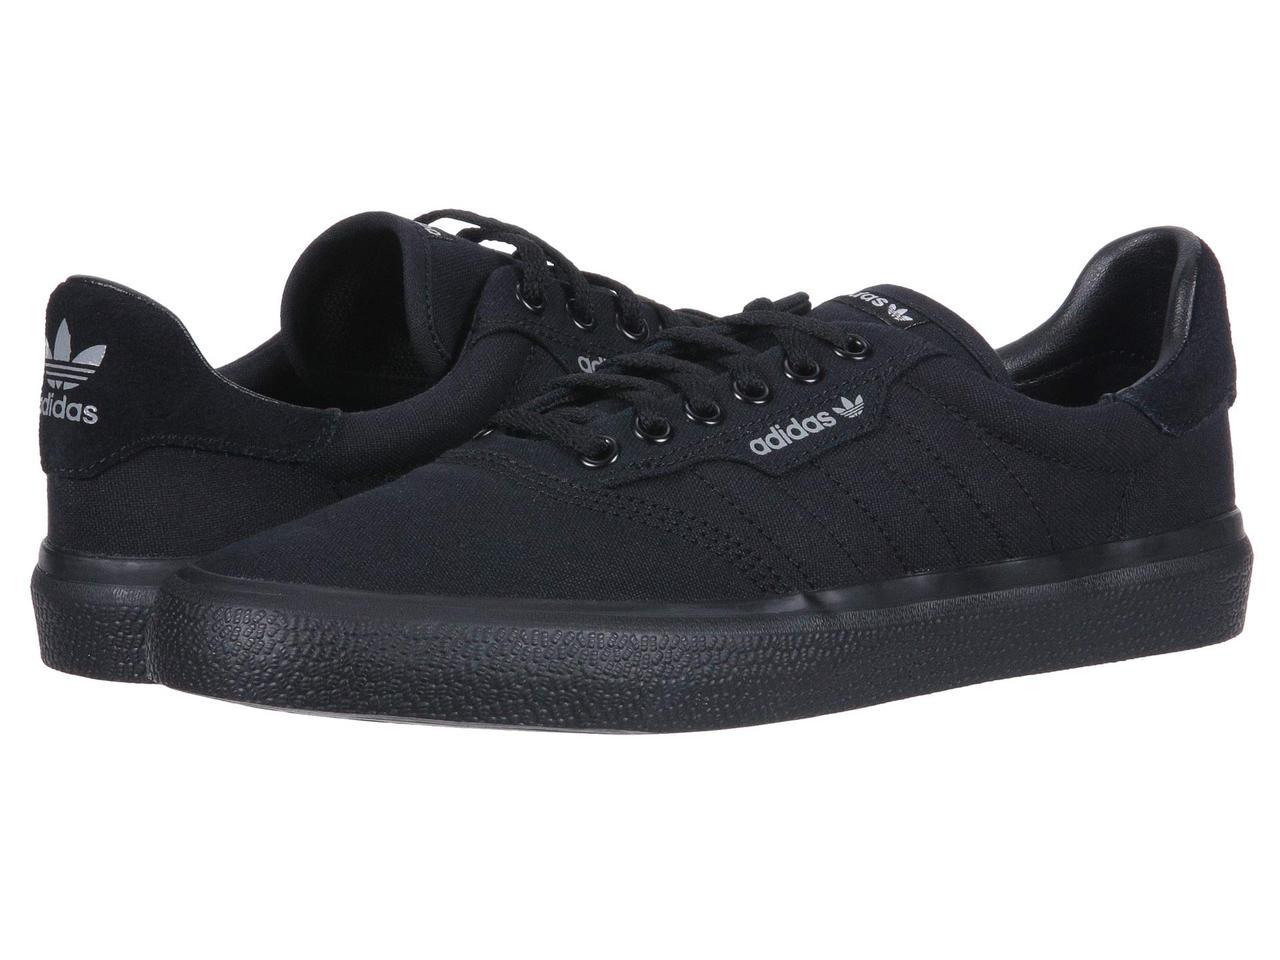 649ff0ad Кроссовки/Кеды (Оригинал) adidas Skateboarding 3MC Black/Black/Grey Two -